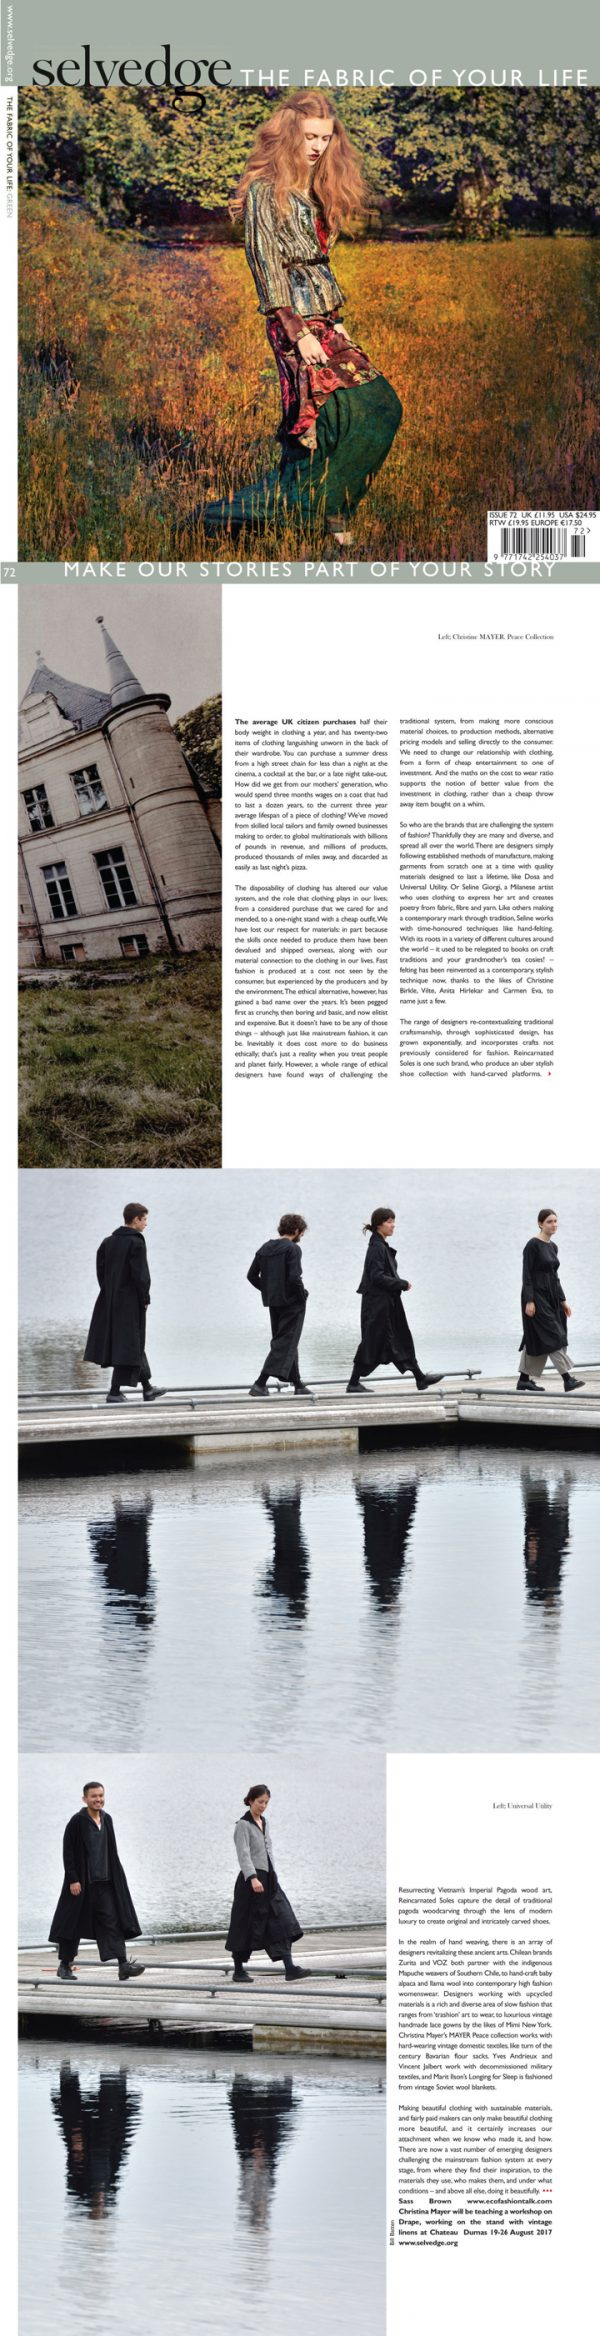 SelvedgeMagazineIssue72Aug16